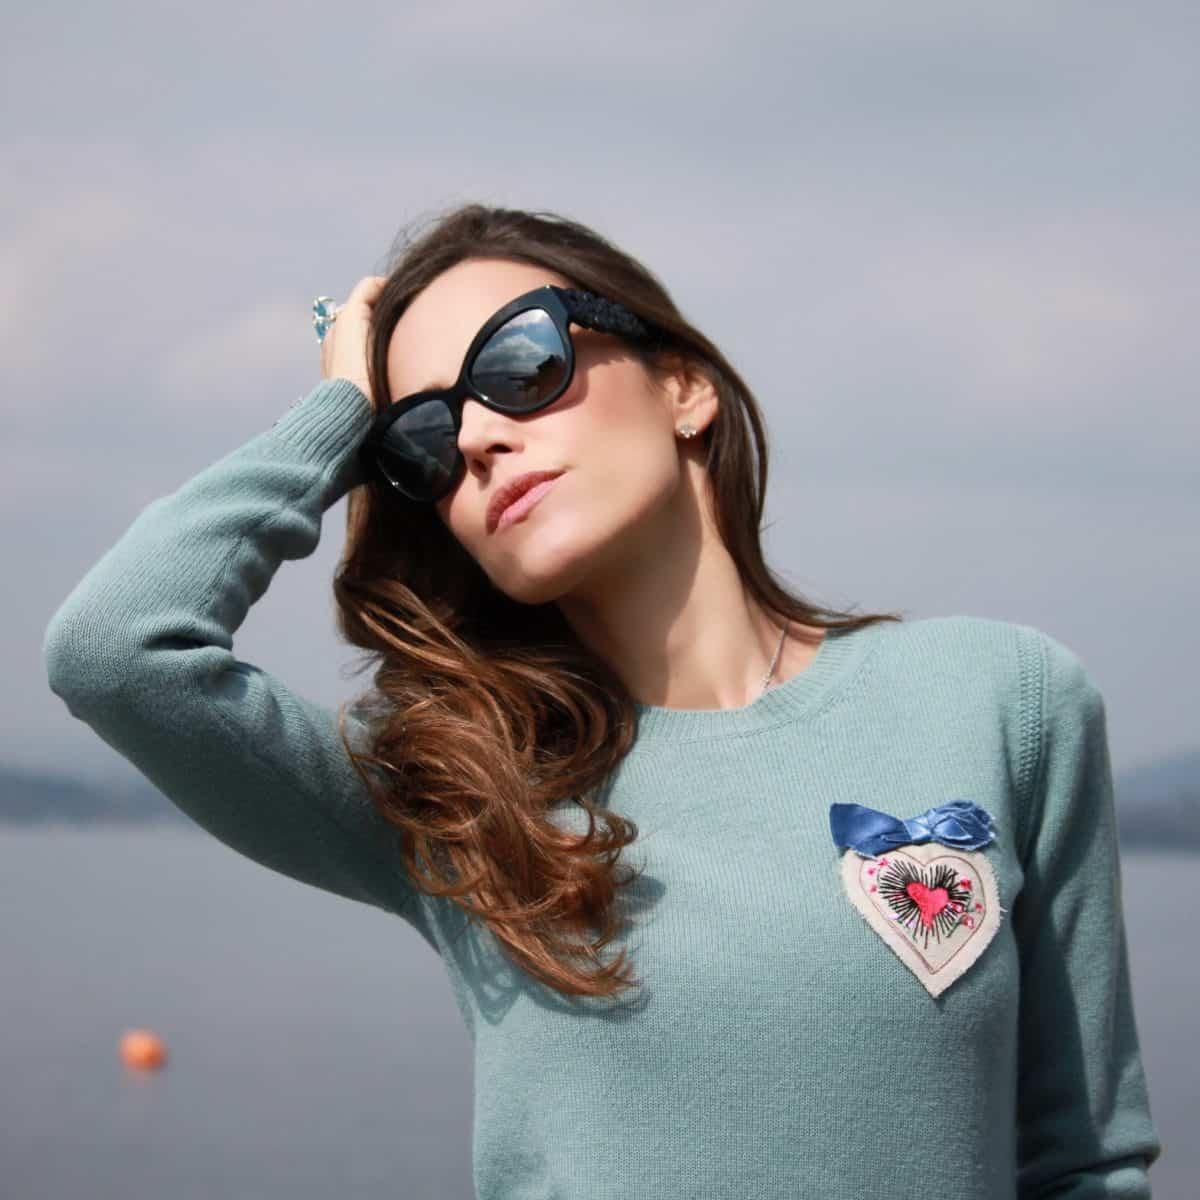 تشخیص عینک فندی اصل و تقلبی